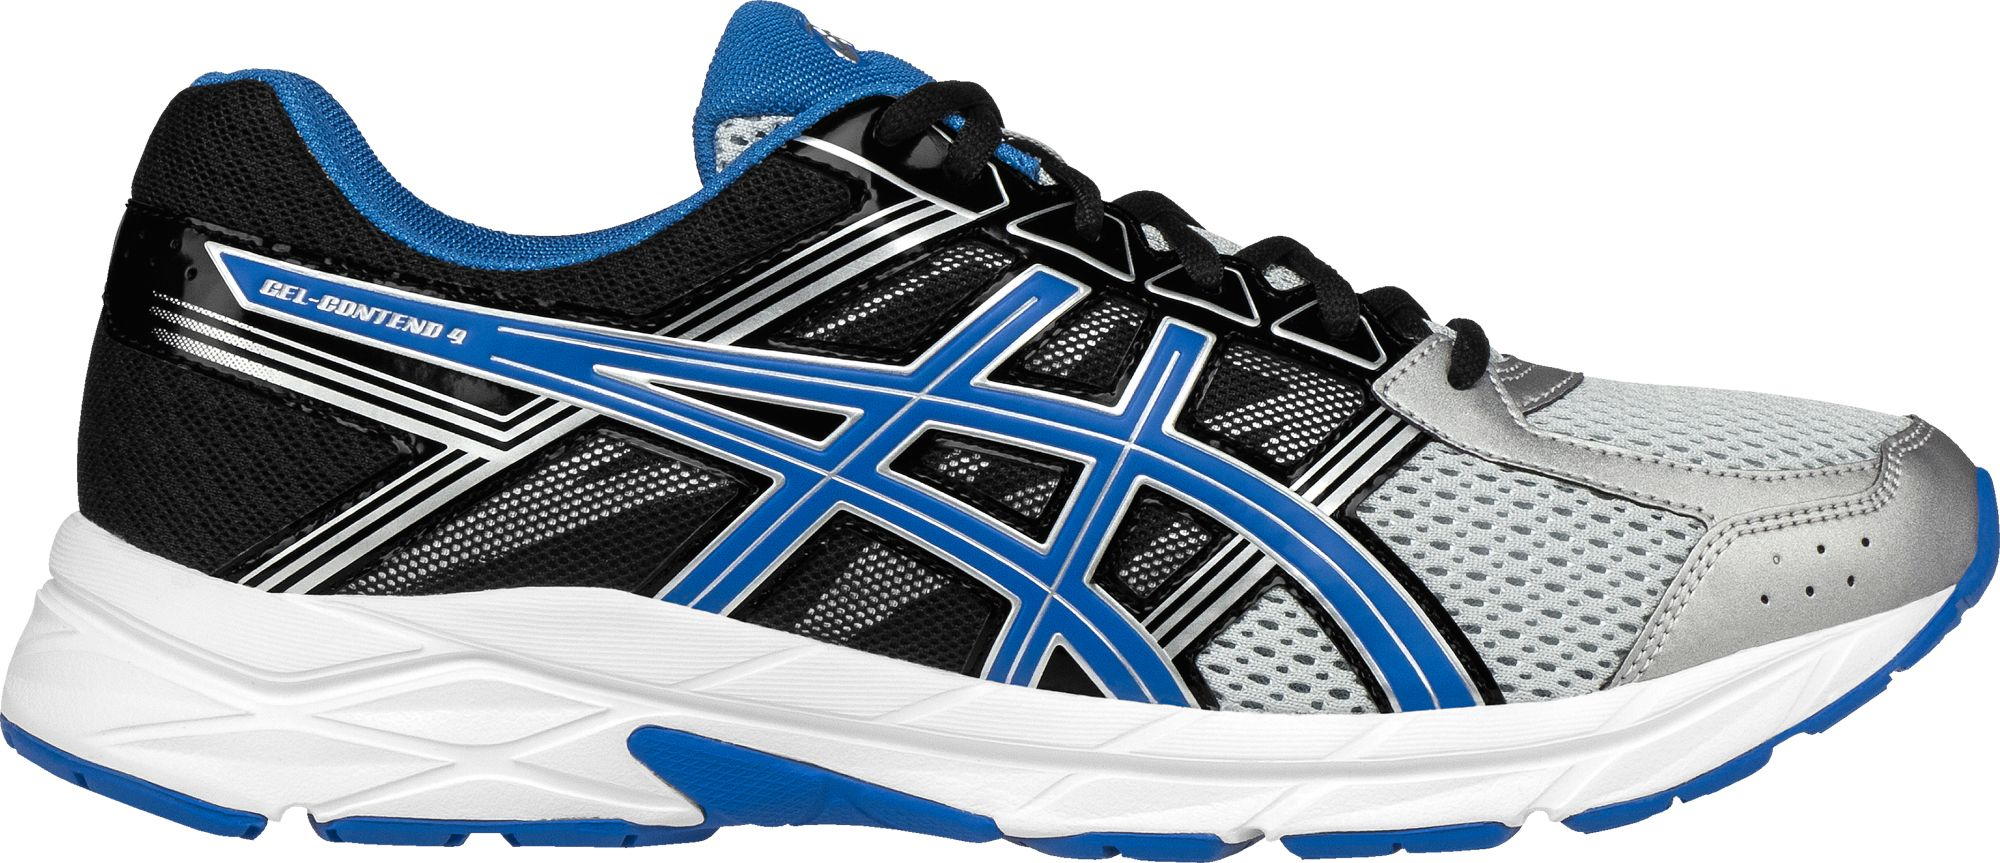 Asics Men's GELContend 4 Running Shoes, Size 9.0, Gray